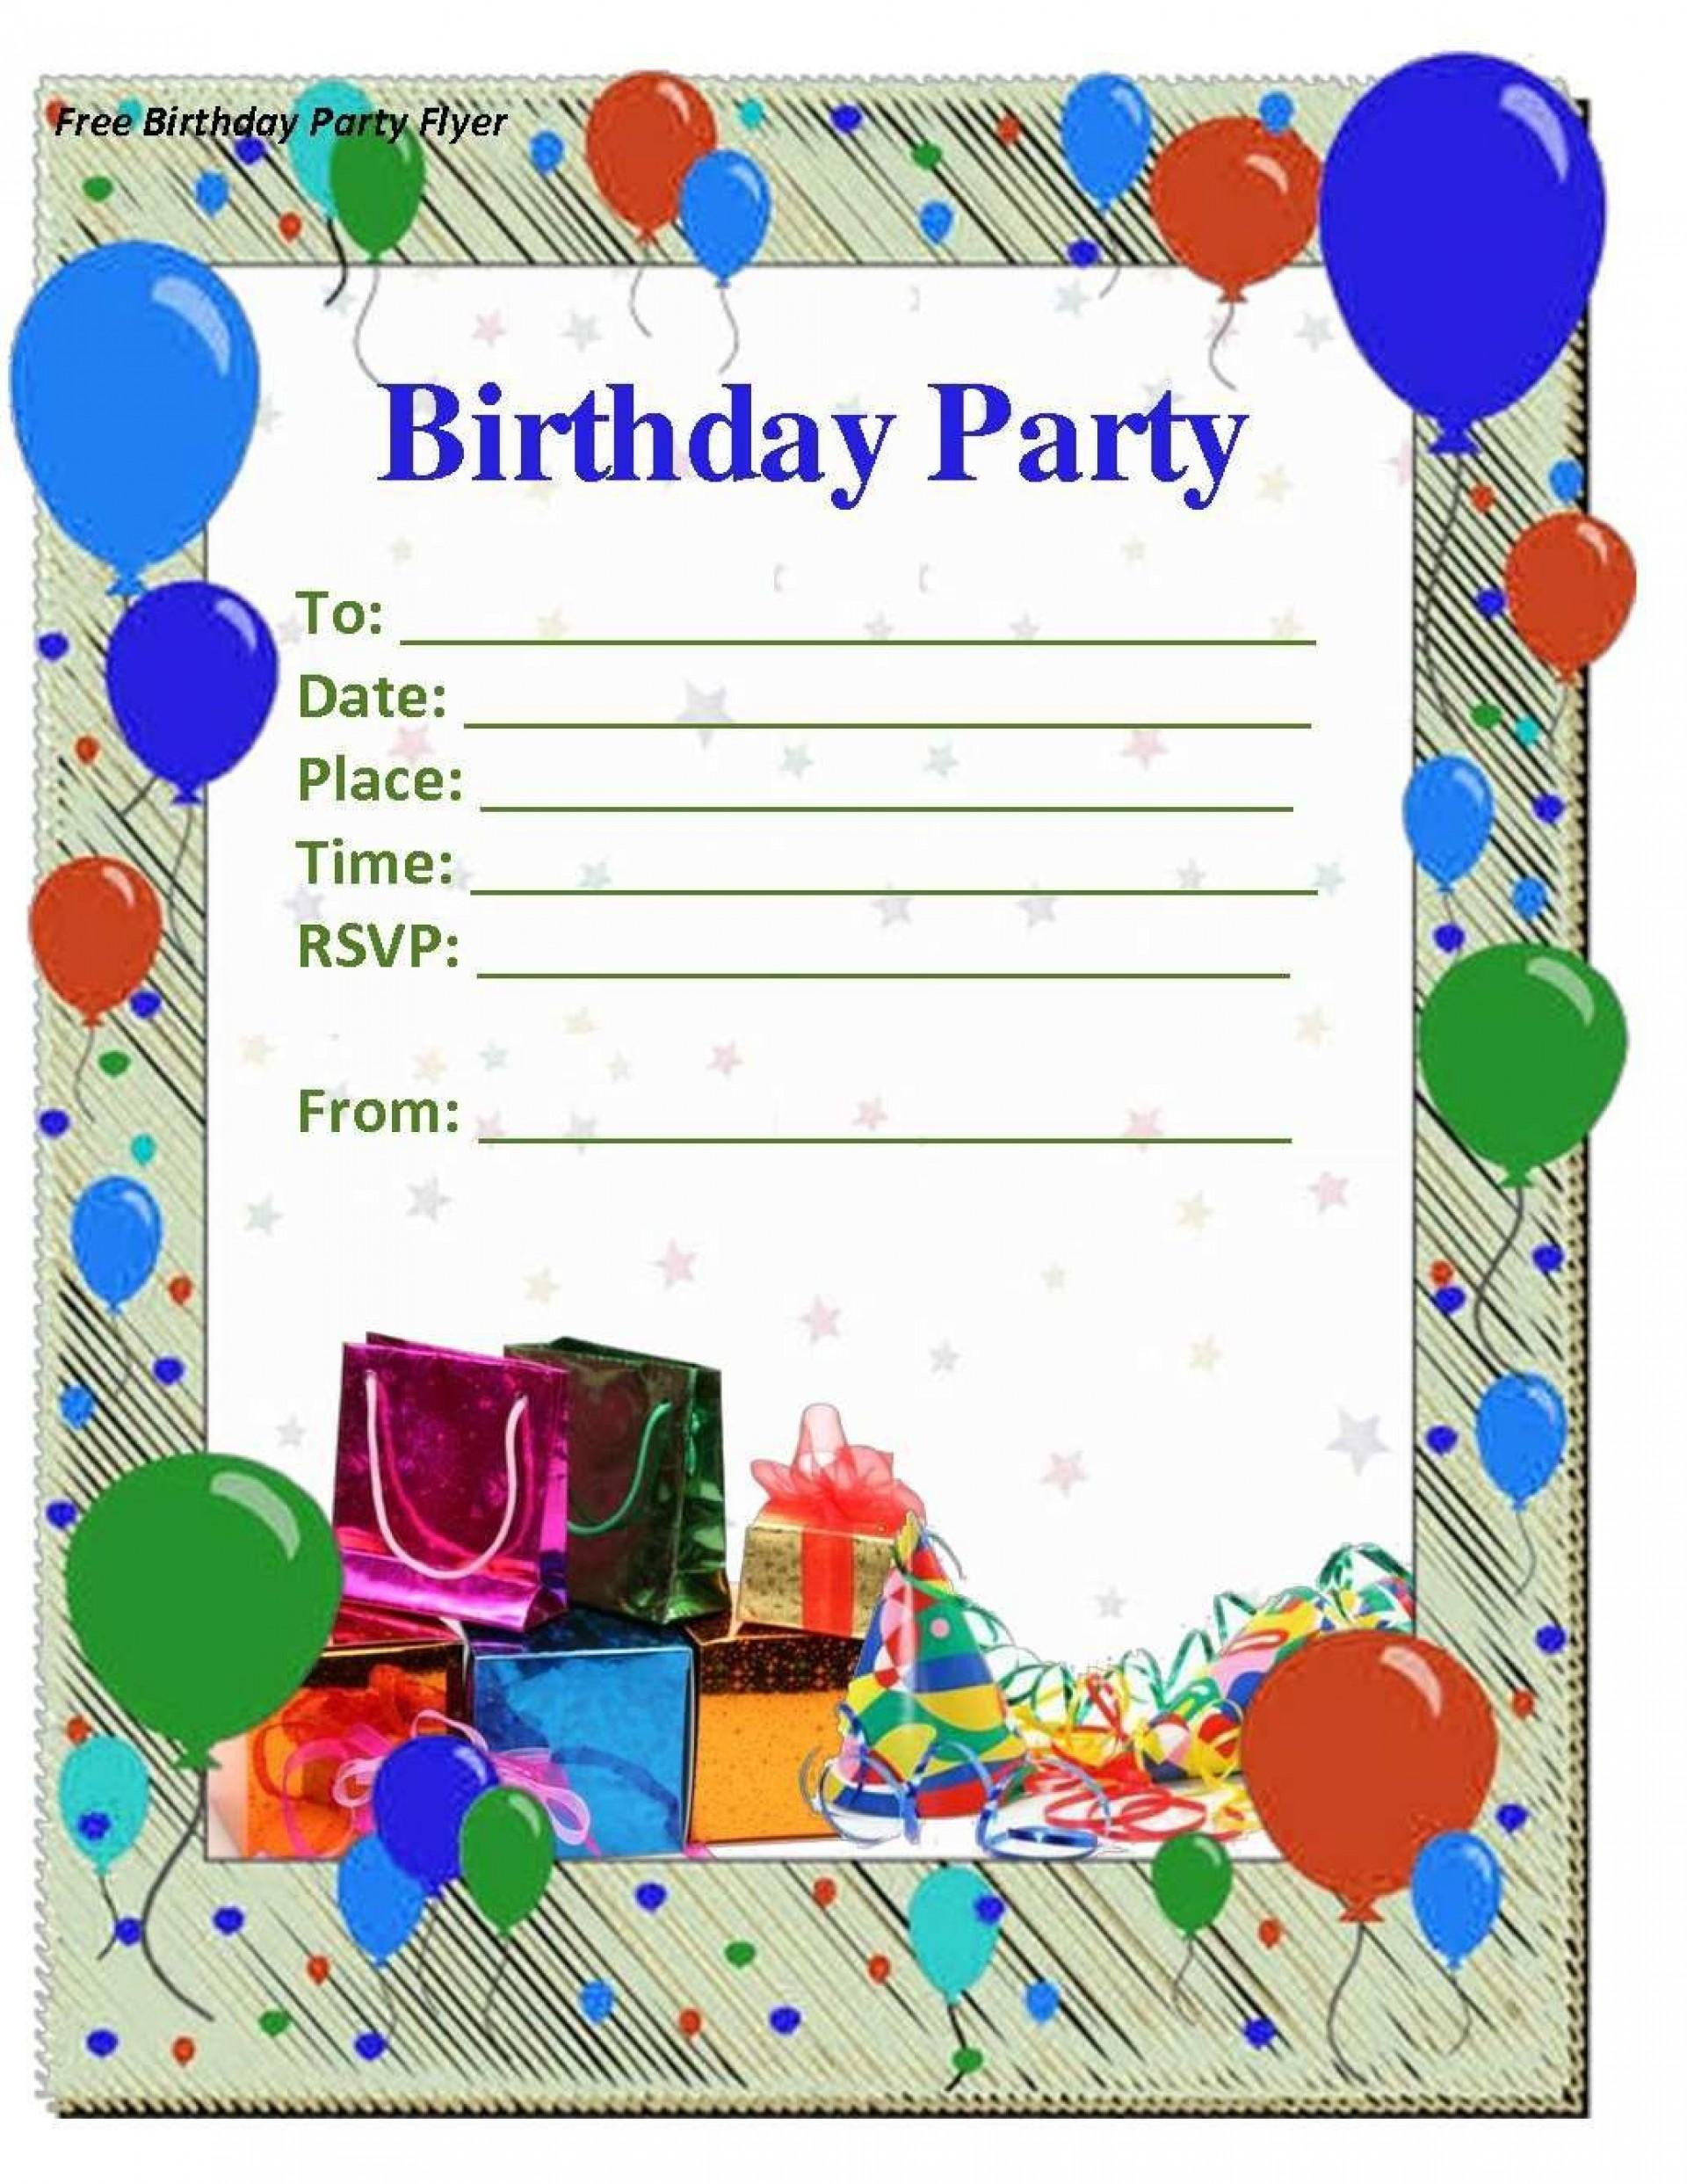 002 Unusual Blank Birthday Card Template Example  Word Free Printable Greeting Download1920